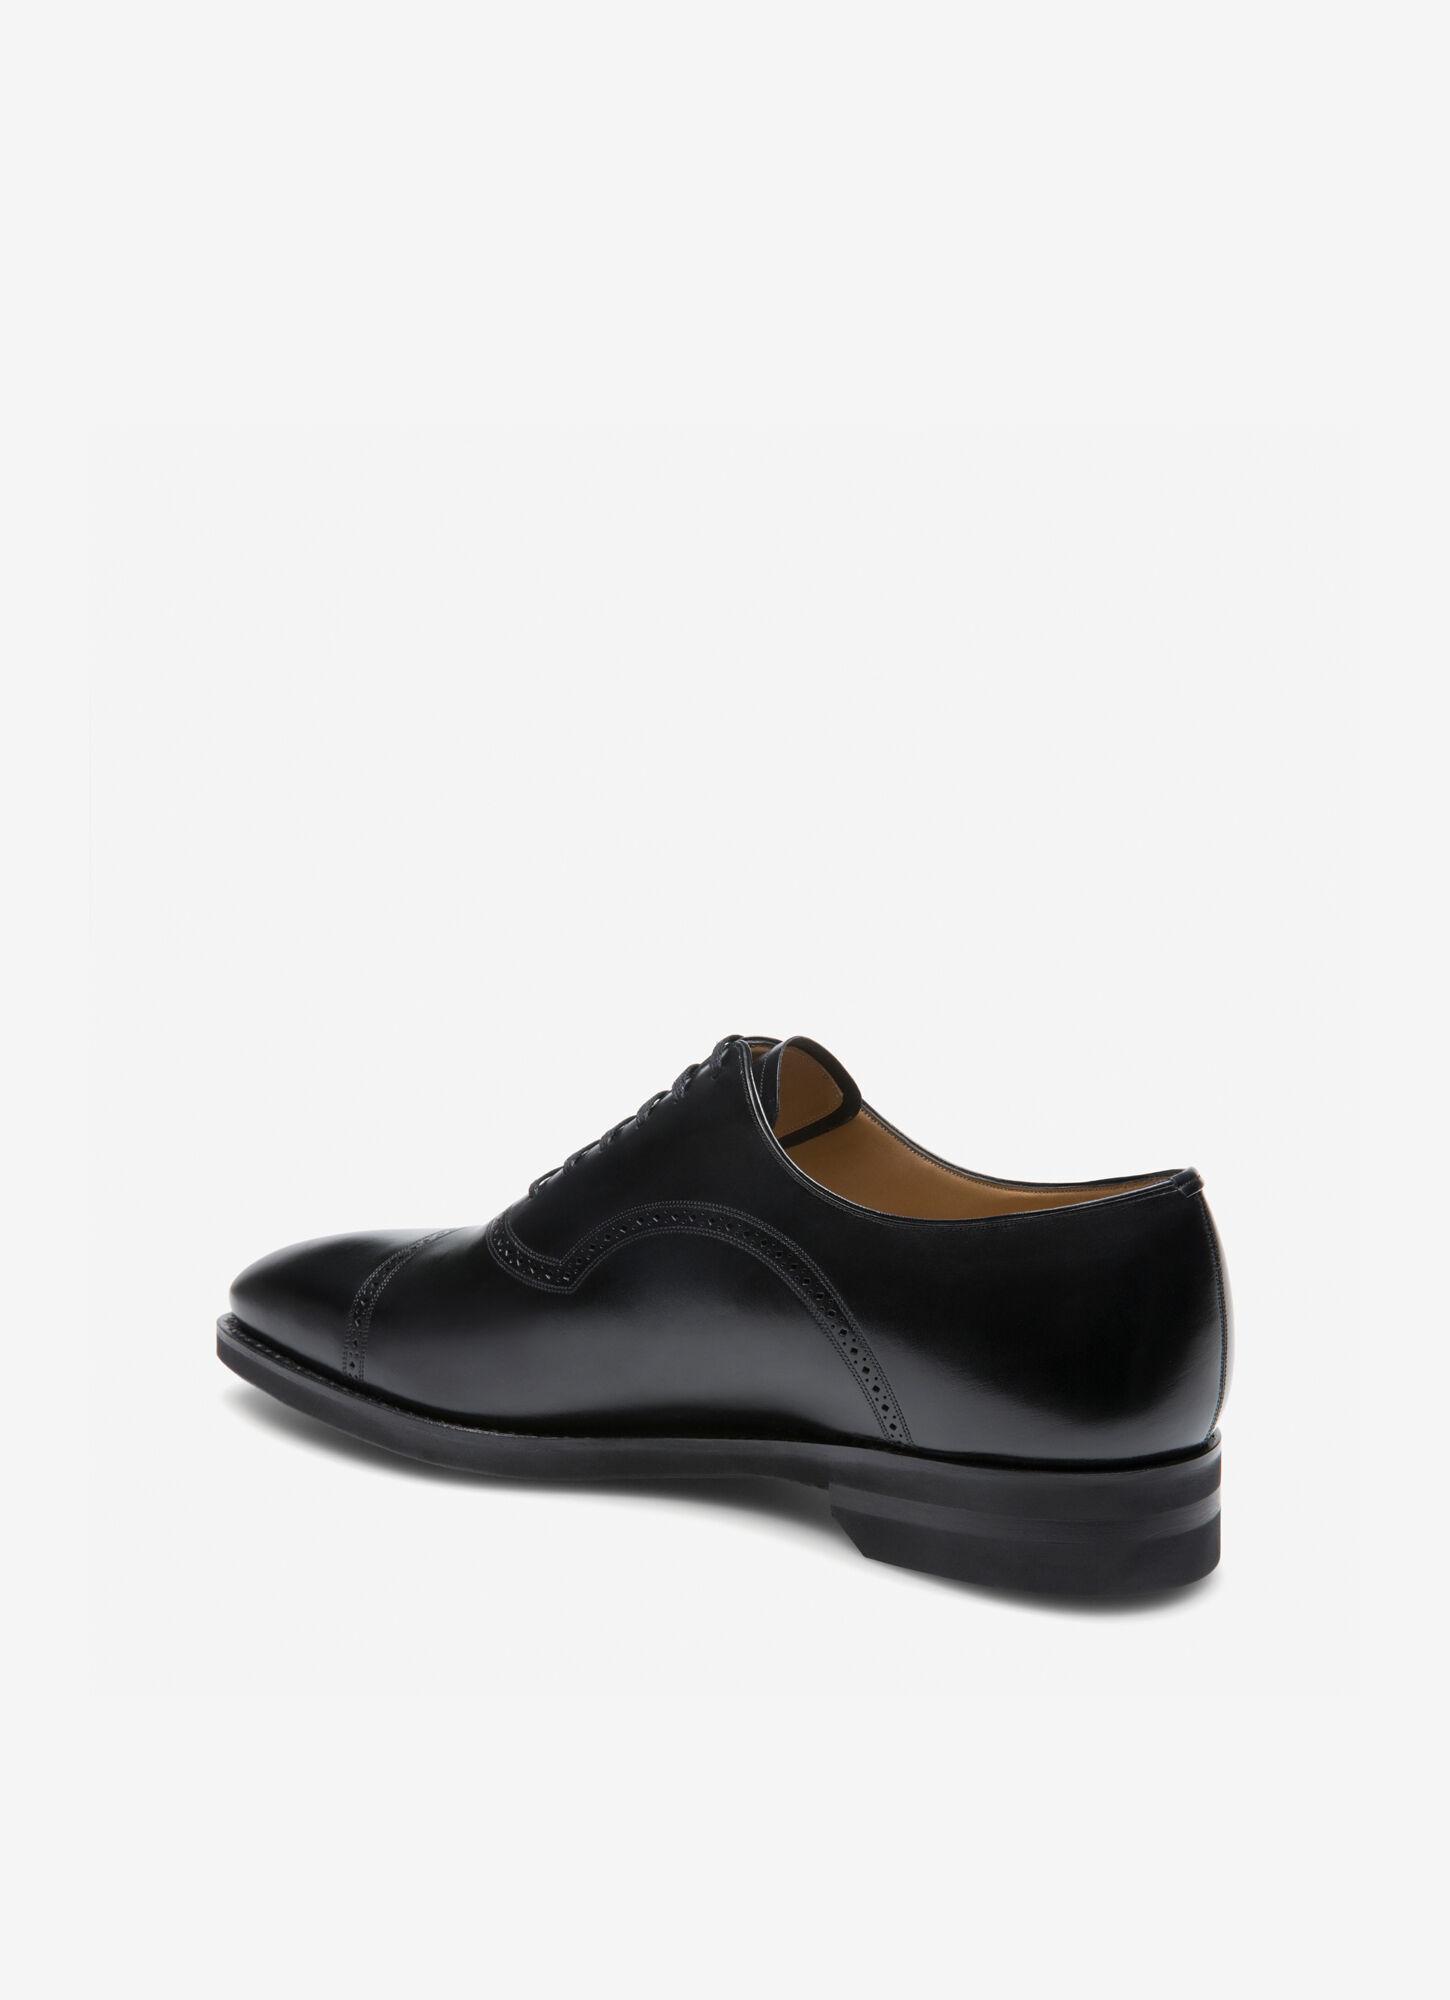 SCOTCH   Men's Lace Up   Bally Shoes